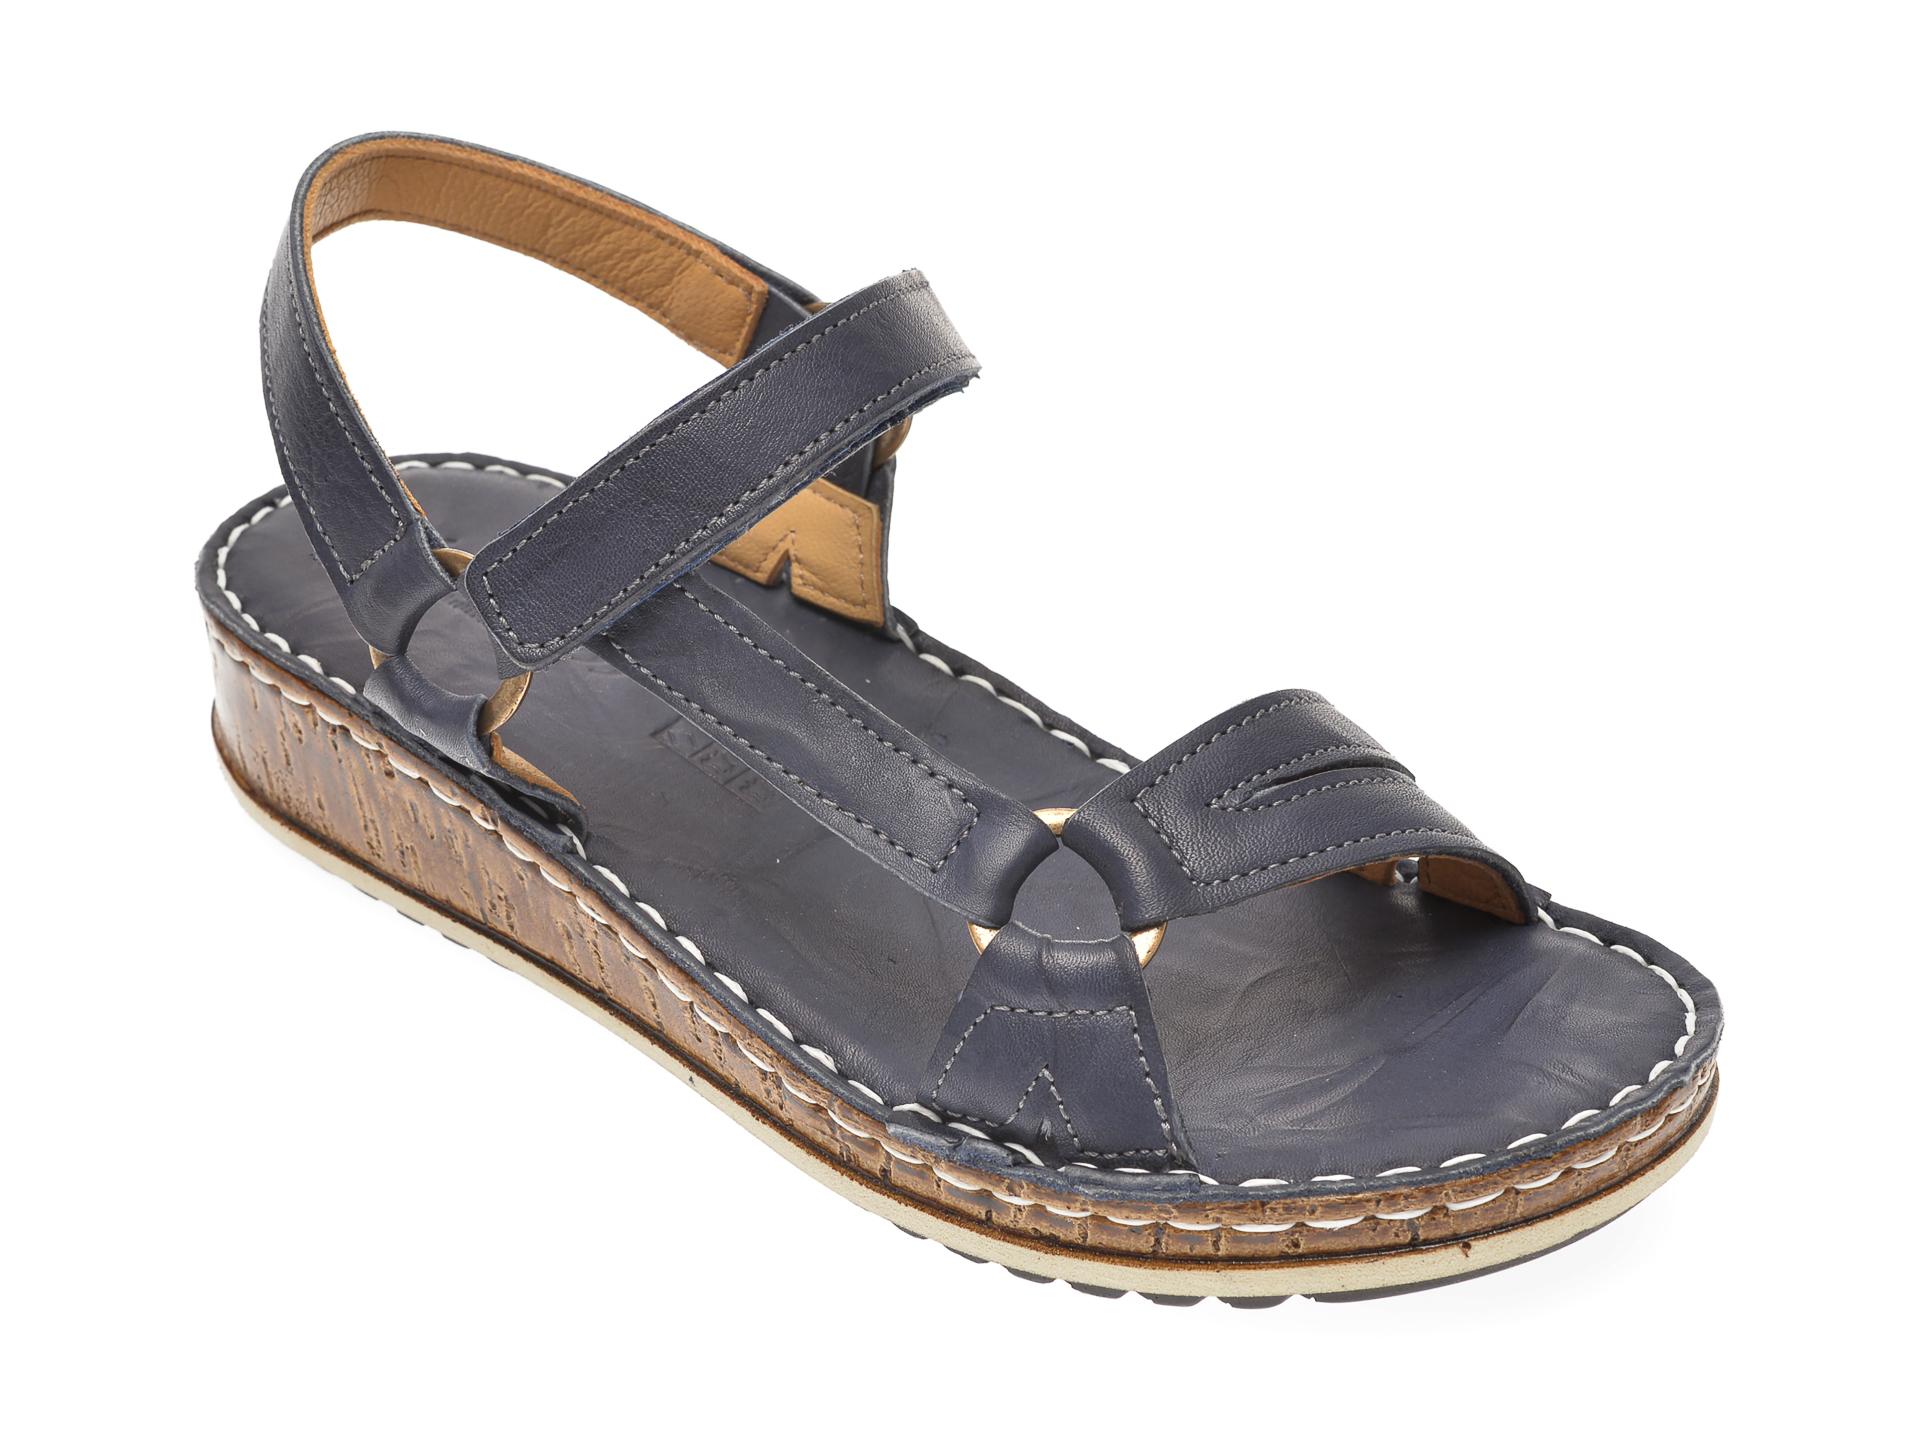 Sandale SINESTRESS bleumarin, 1326, din piele naturala